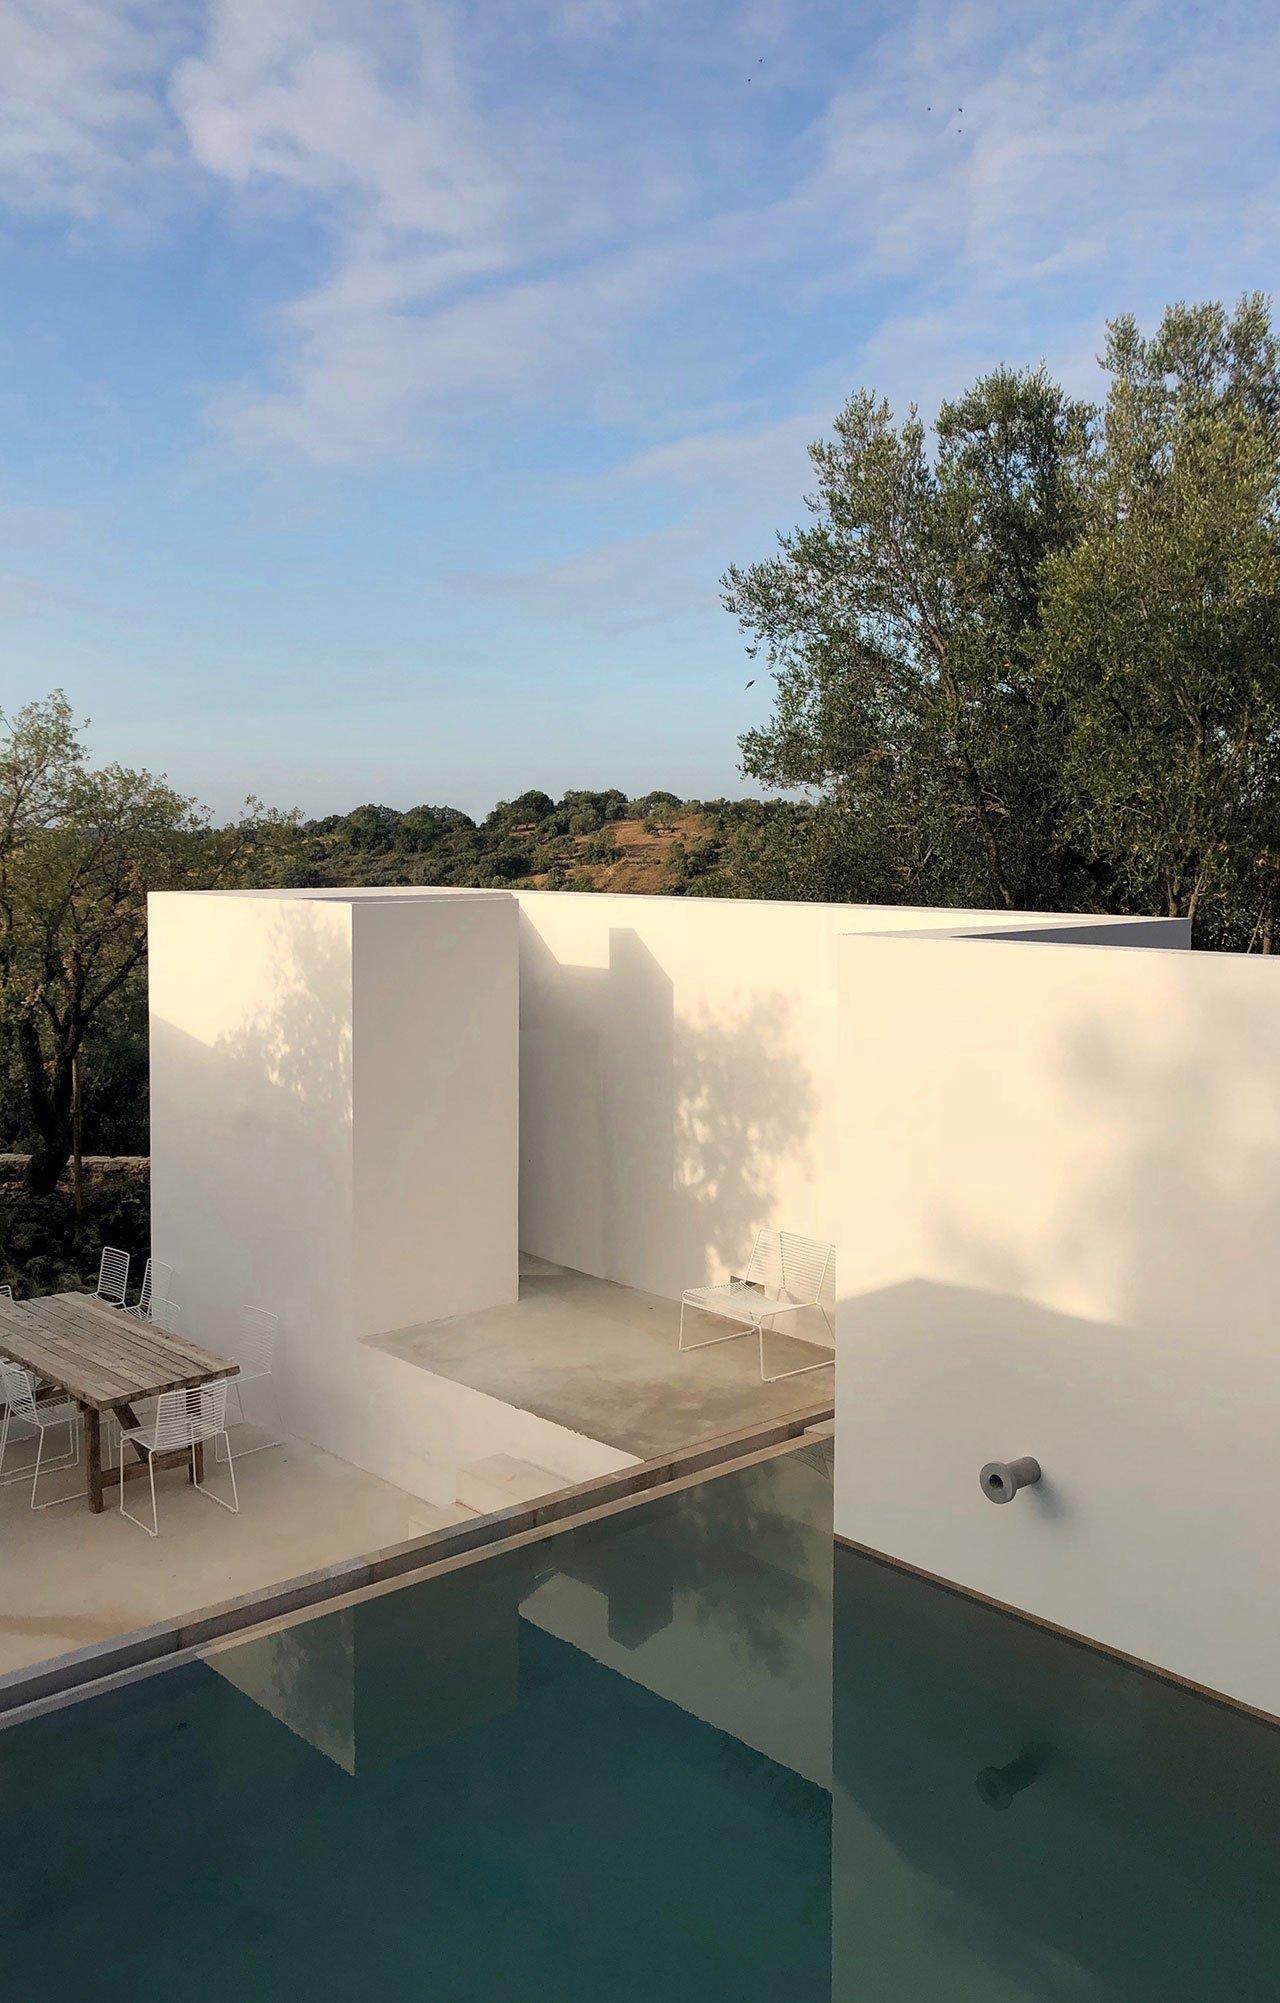 casa-luum-minimalizmus-a-portugal-videken-noko-028.jpg